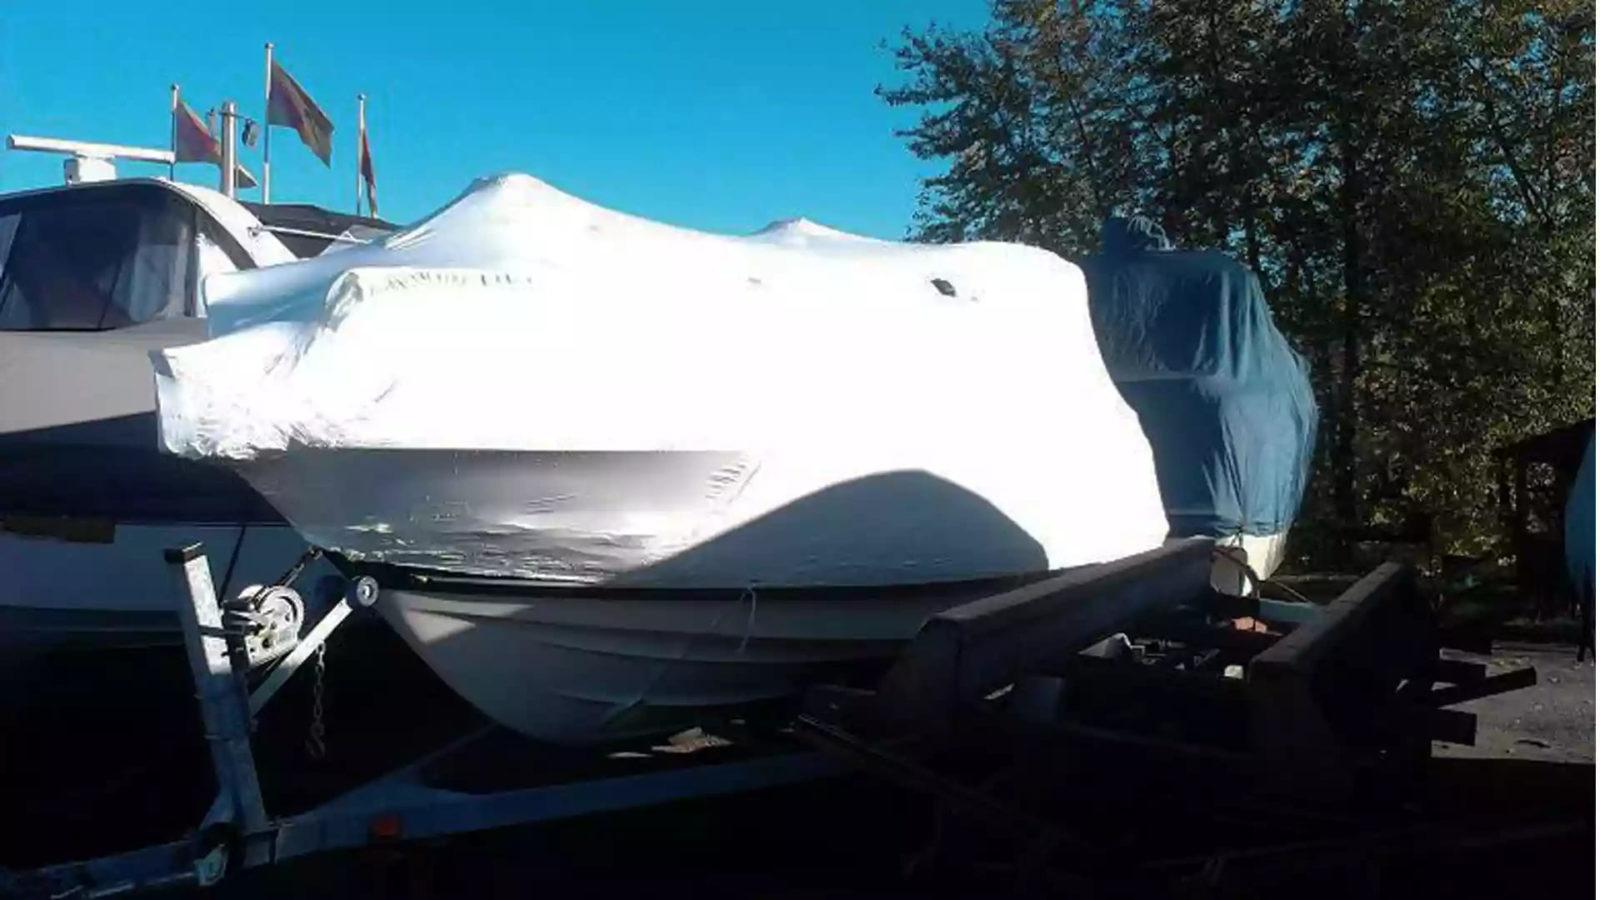 Укрытие яхты